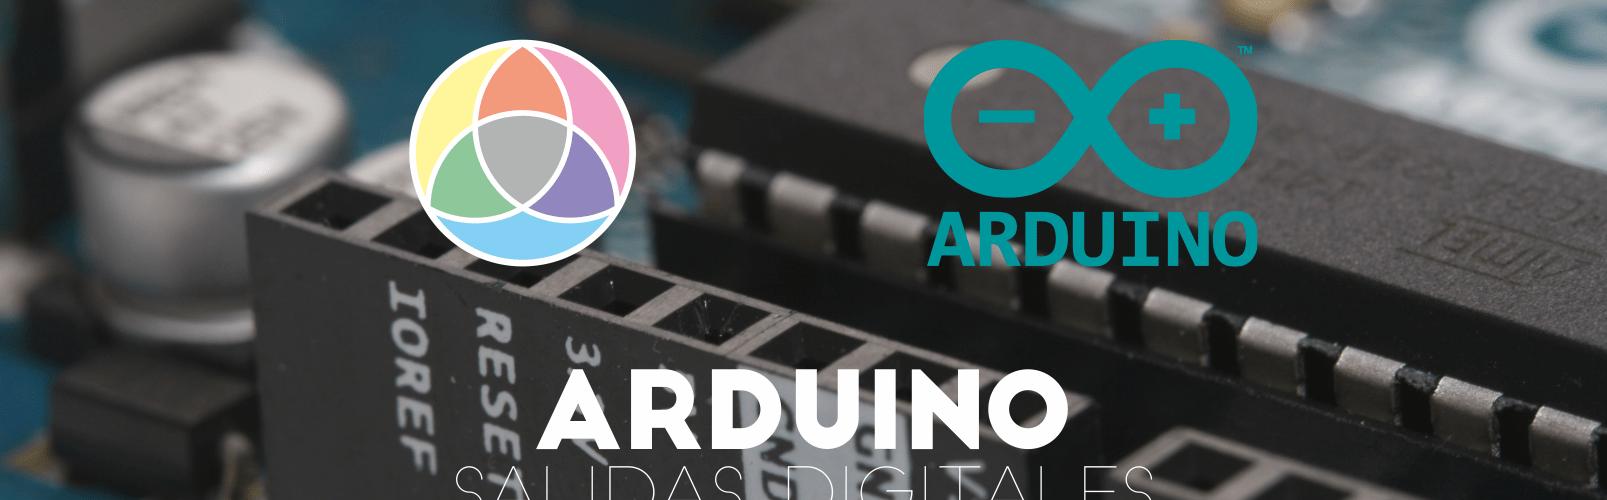 Salidas digitales Arduino